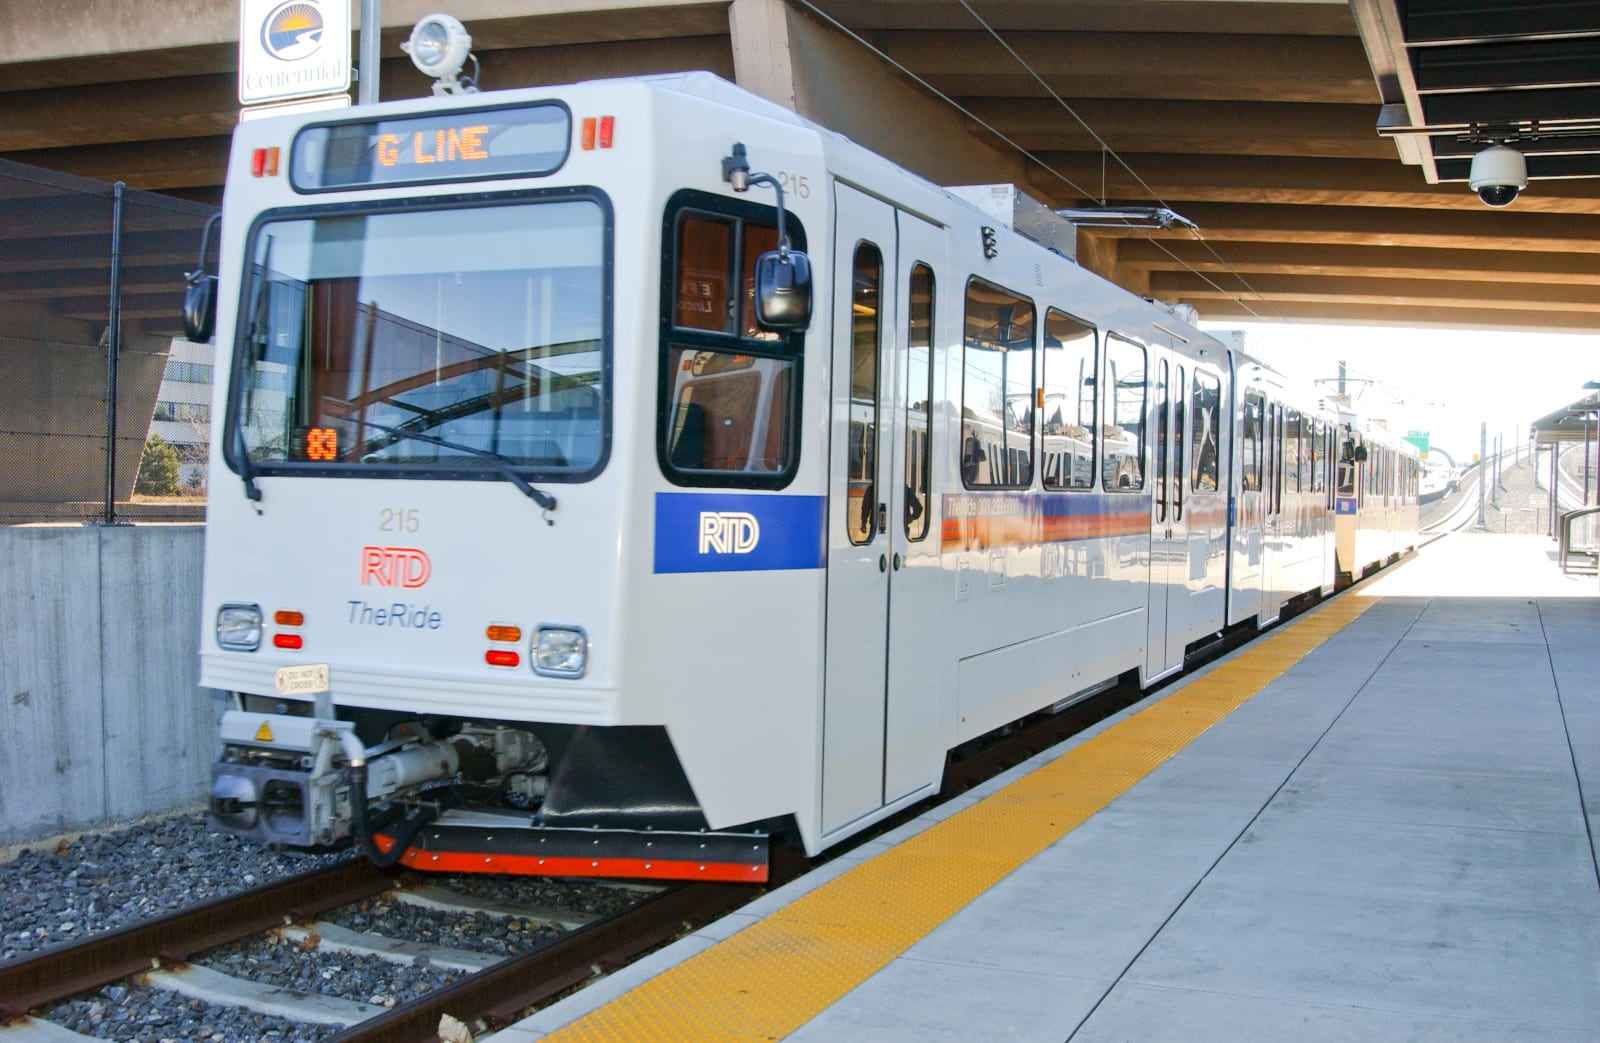 RTD Train G Line Denver At Station